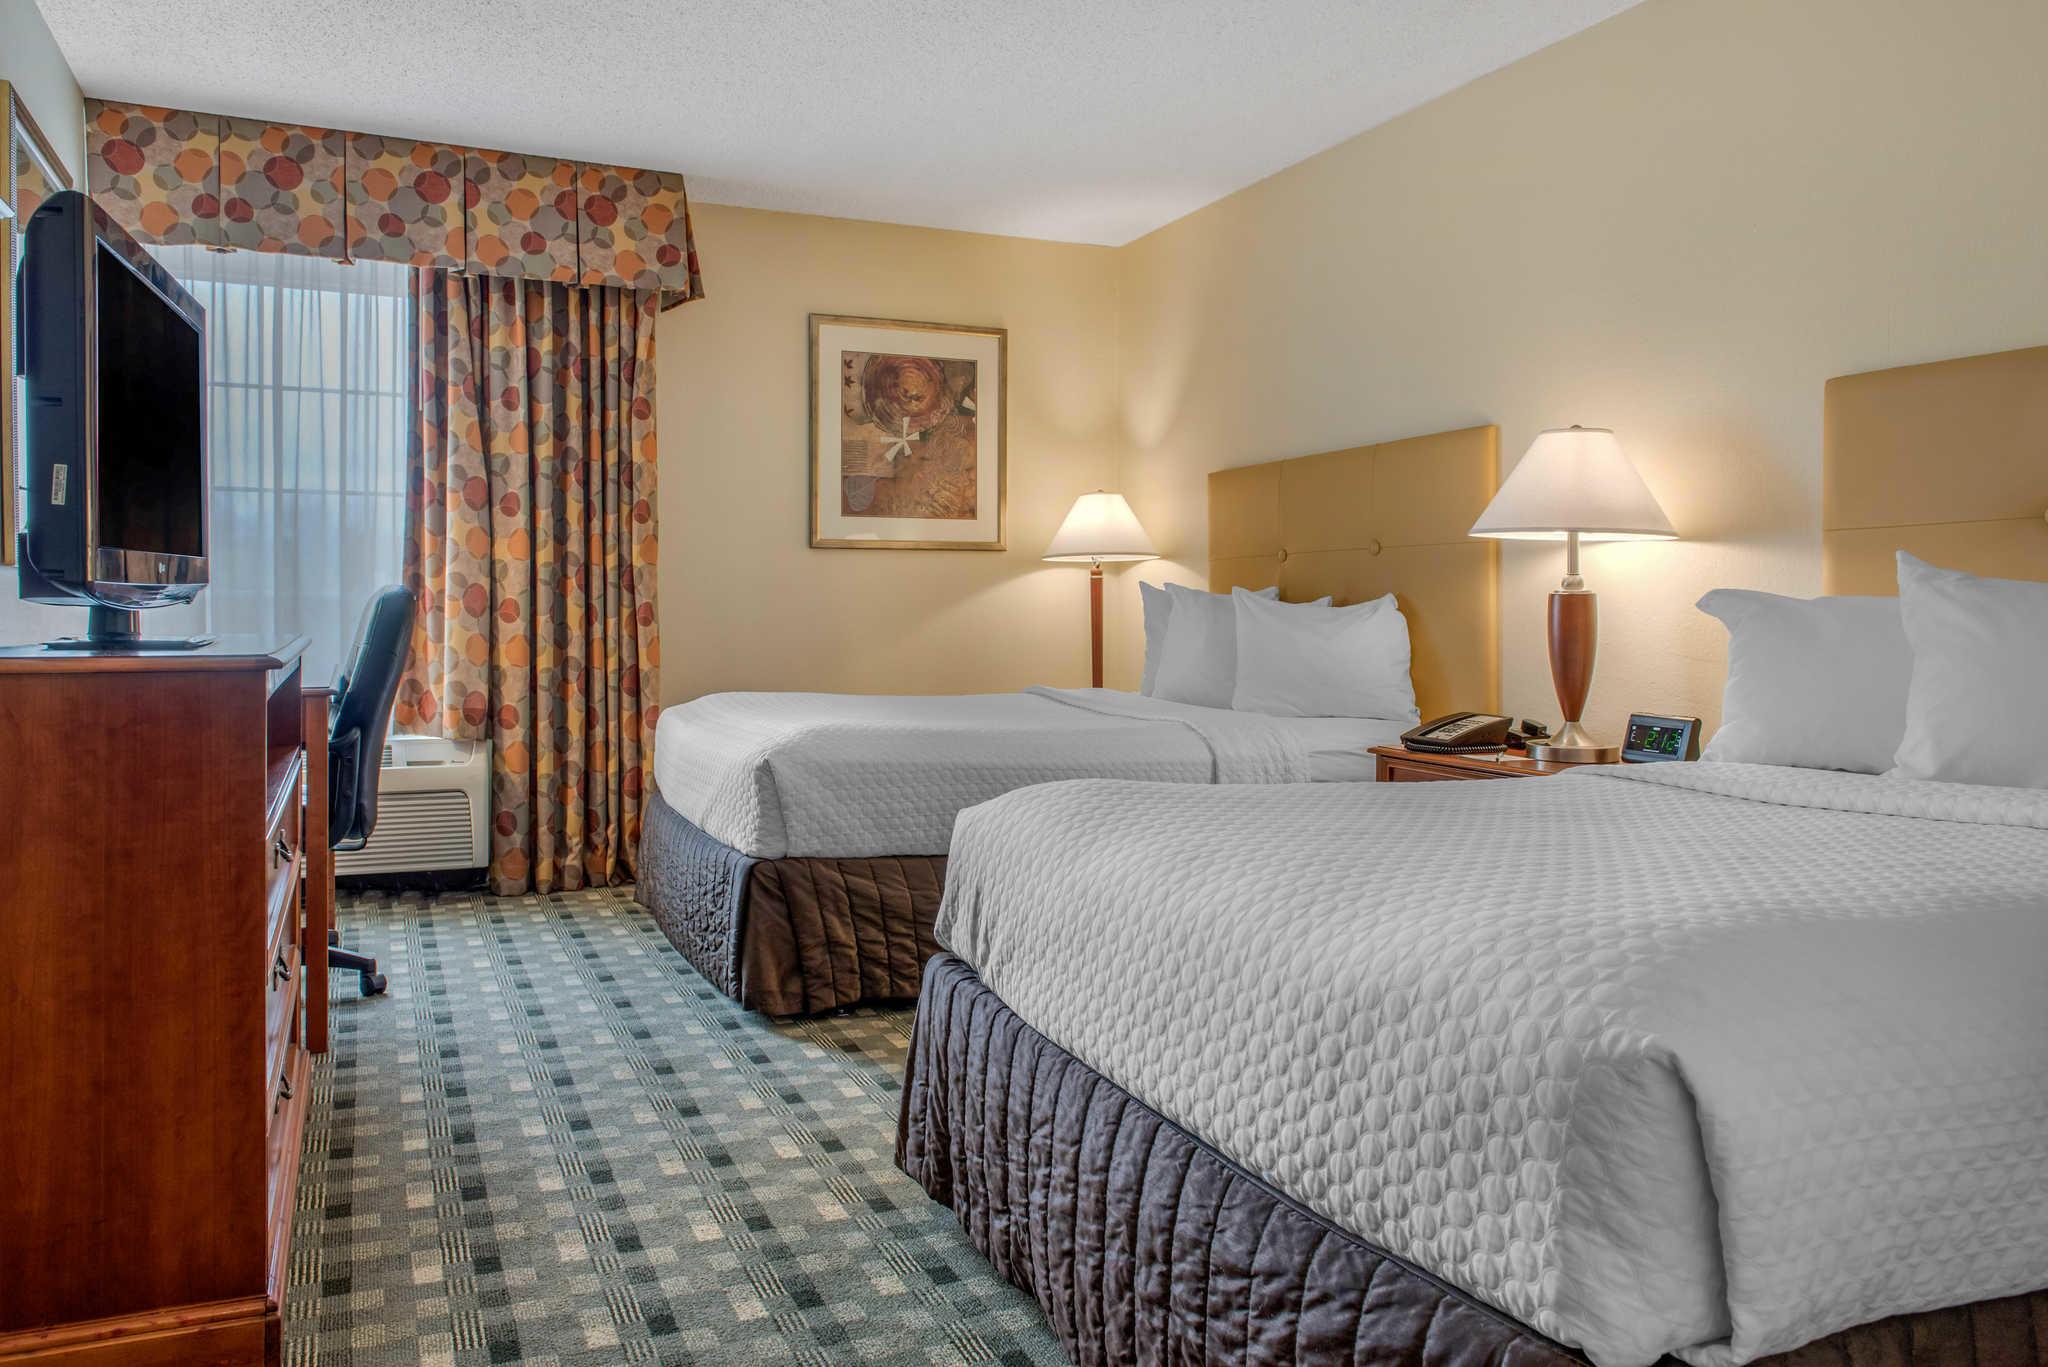 Quality Hotel - Cincinnati Blue Ash image 6